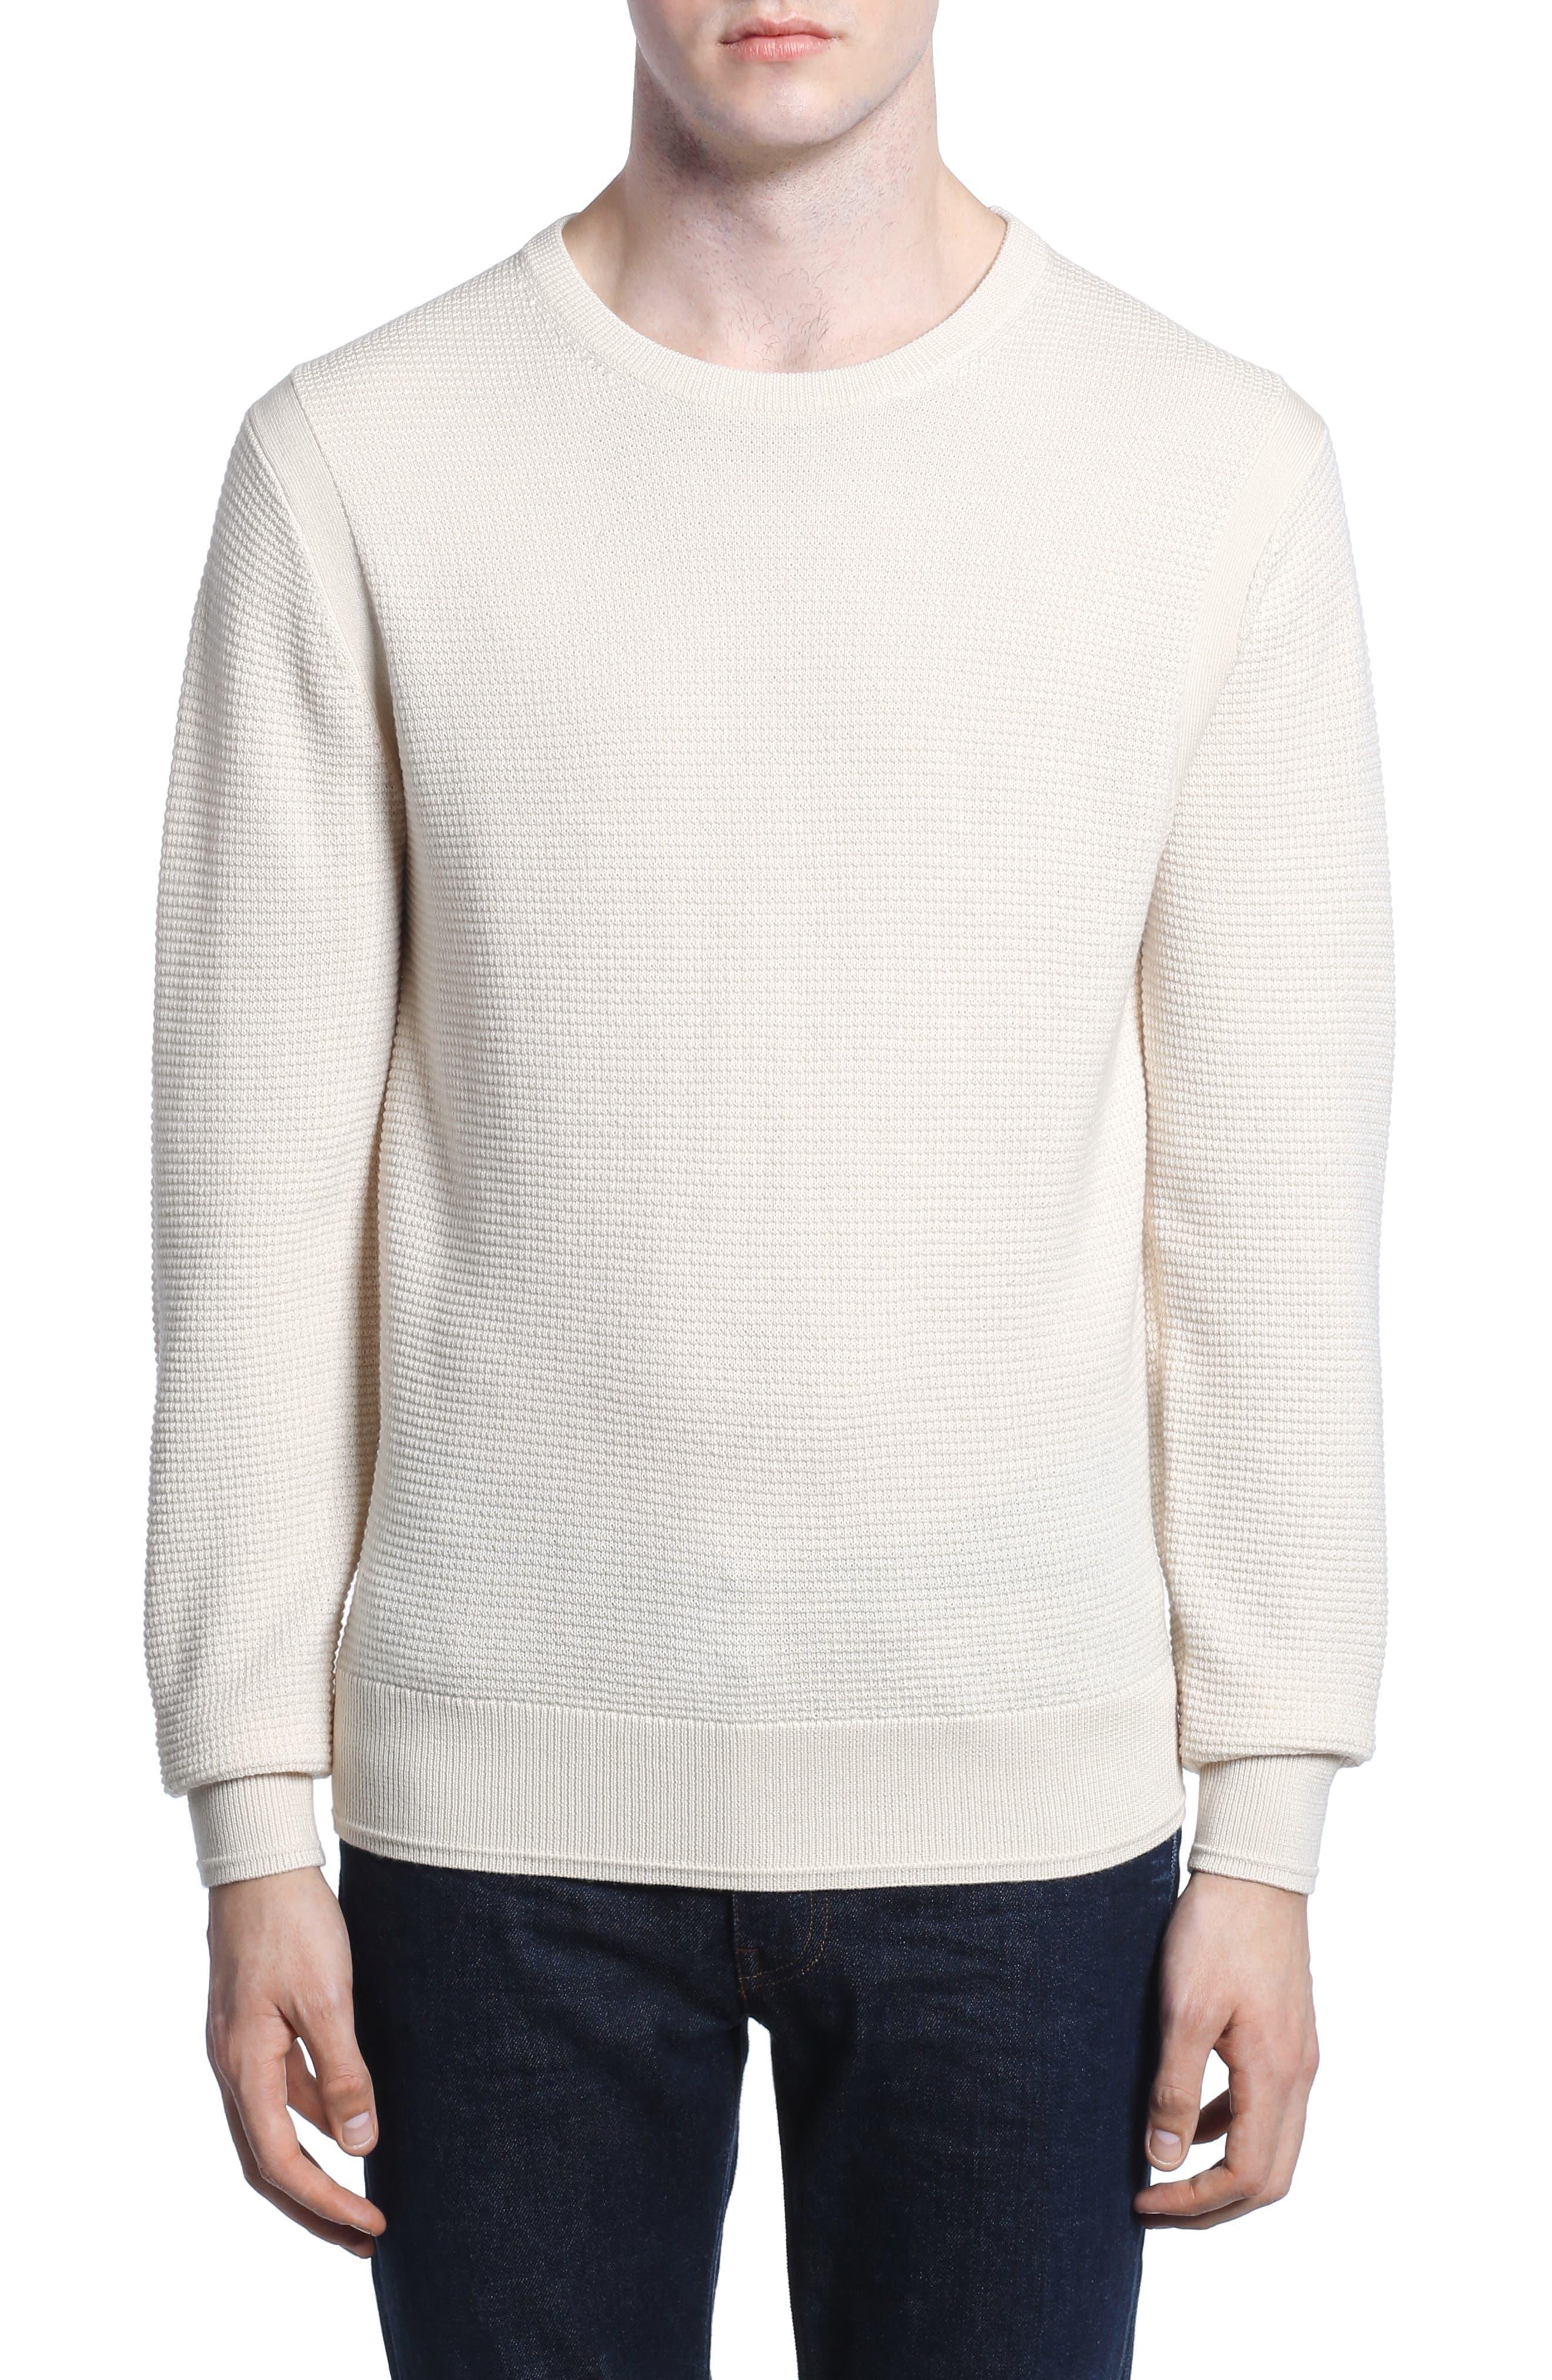 Merino Waffle Knit Wool Sweater,                         Main,                         color, 104